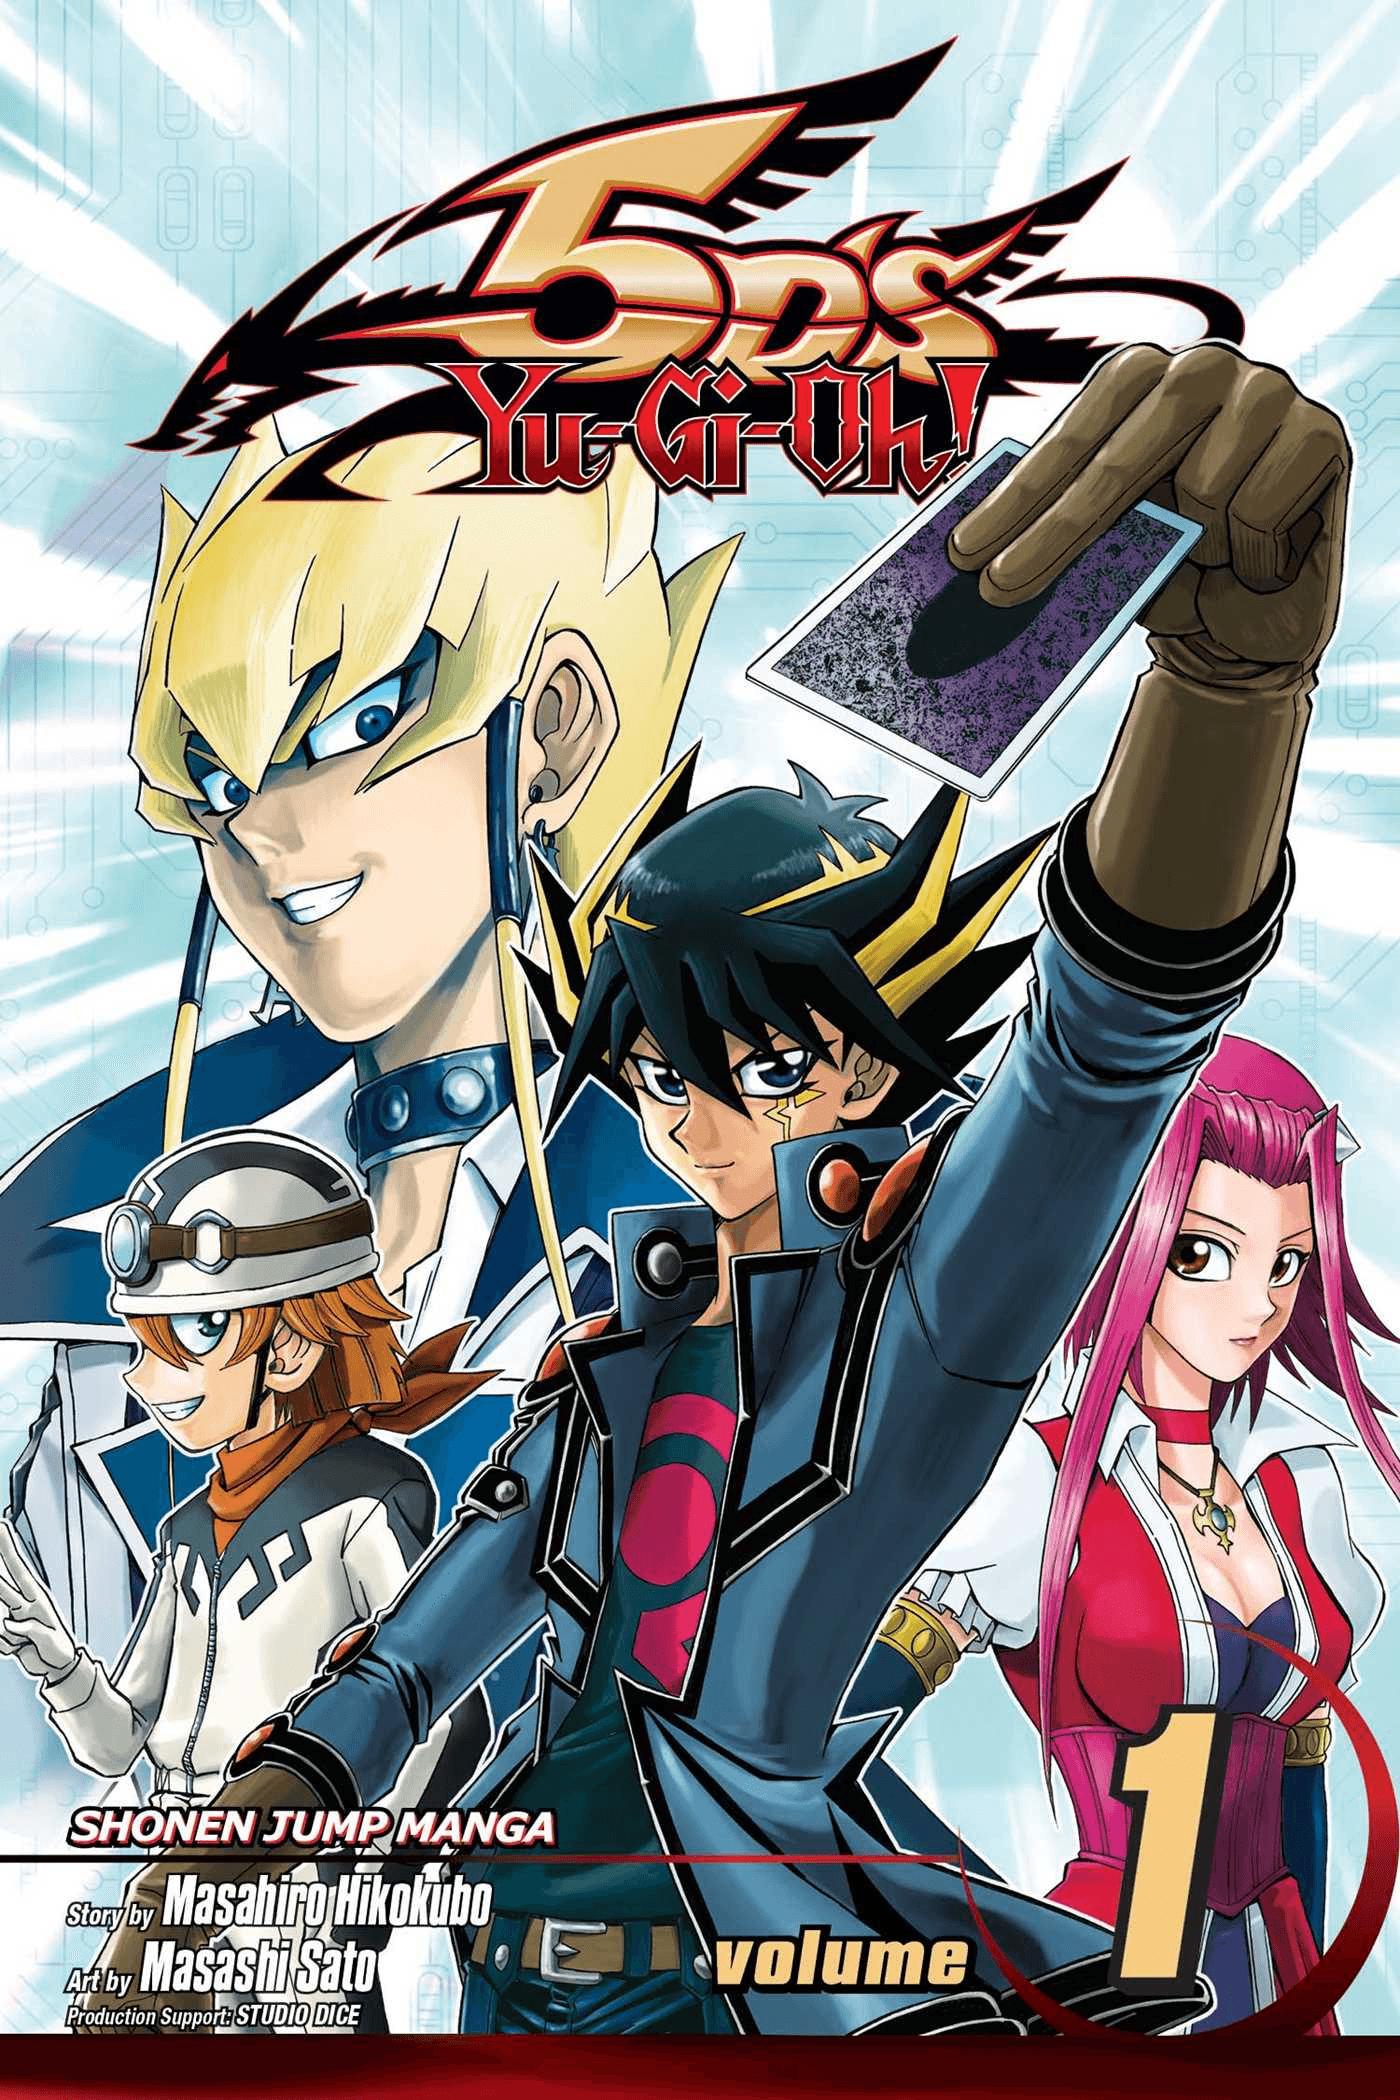 Yu-Gi-Oh! 5D's (manga)   Yu-Gi-Oh!   FANDOM powered by Wikia - photo#27